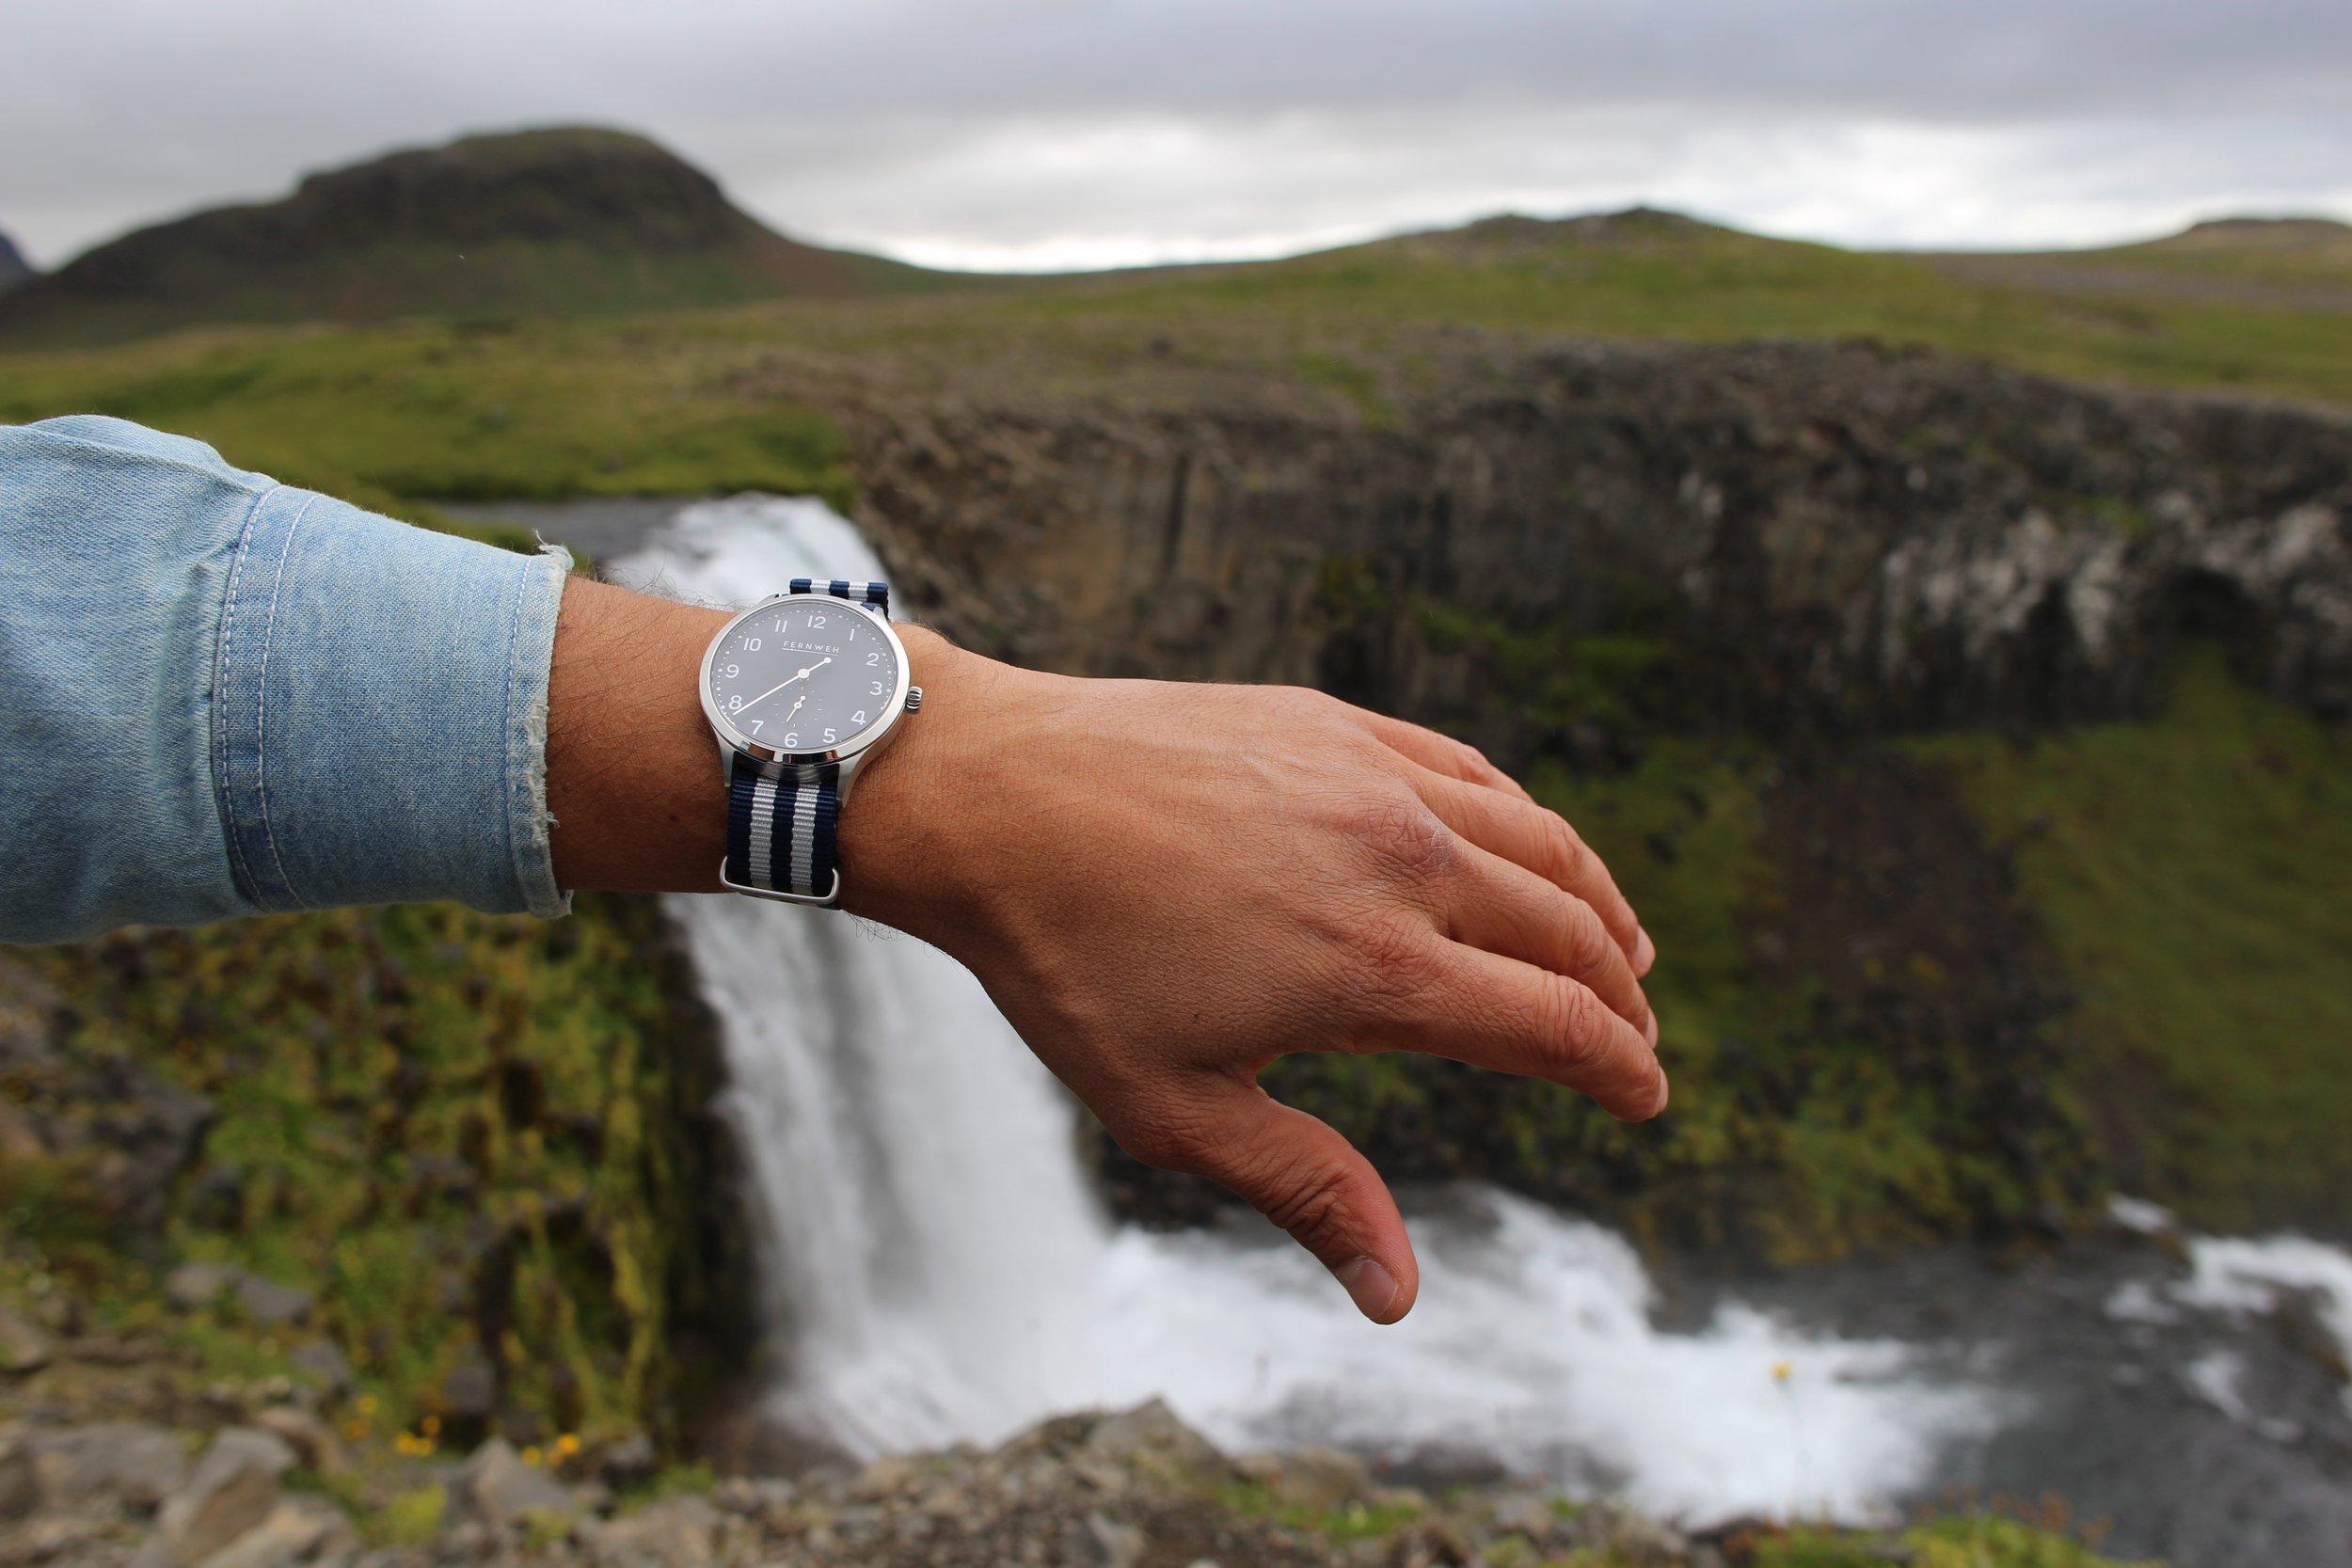 Fernweh watches